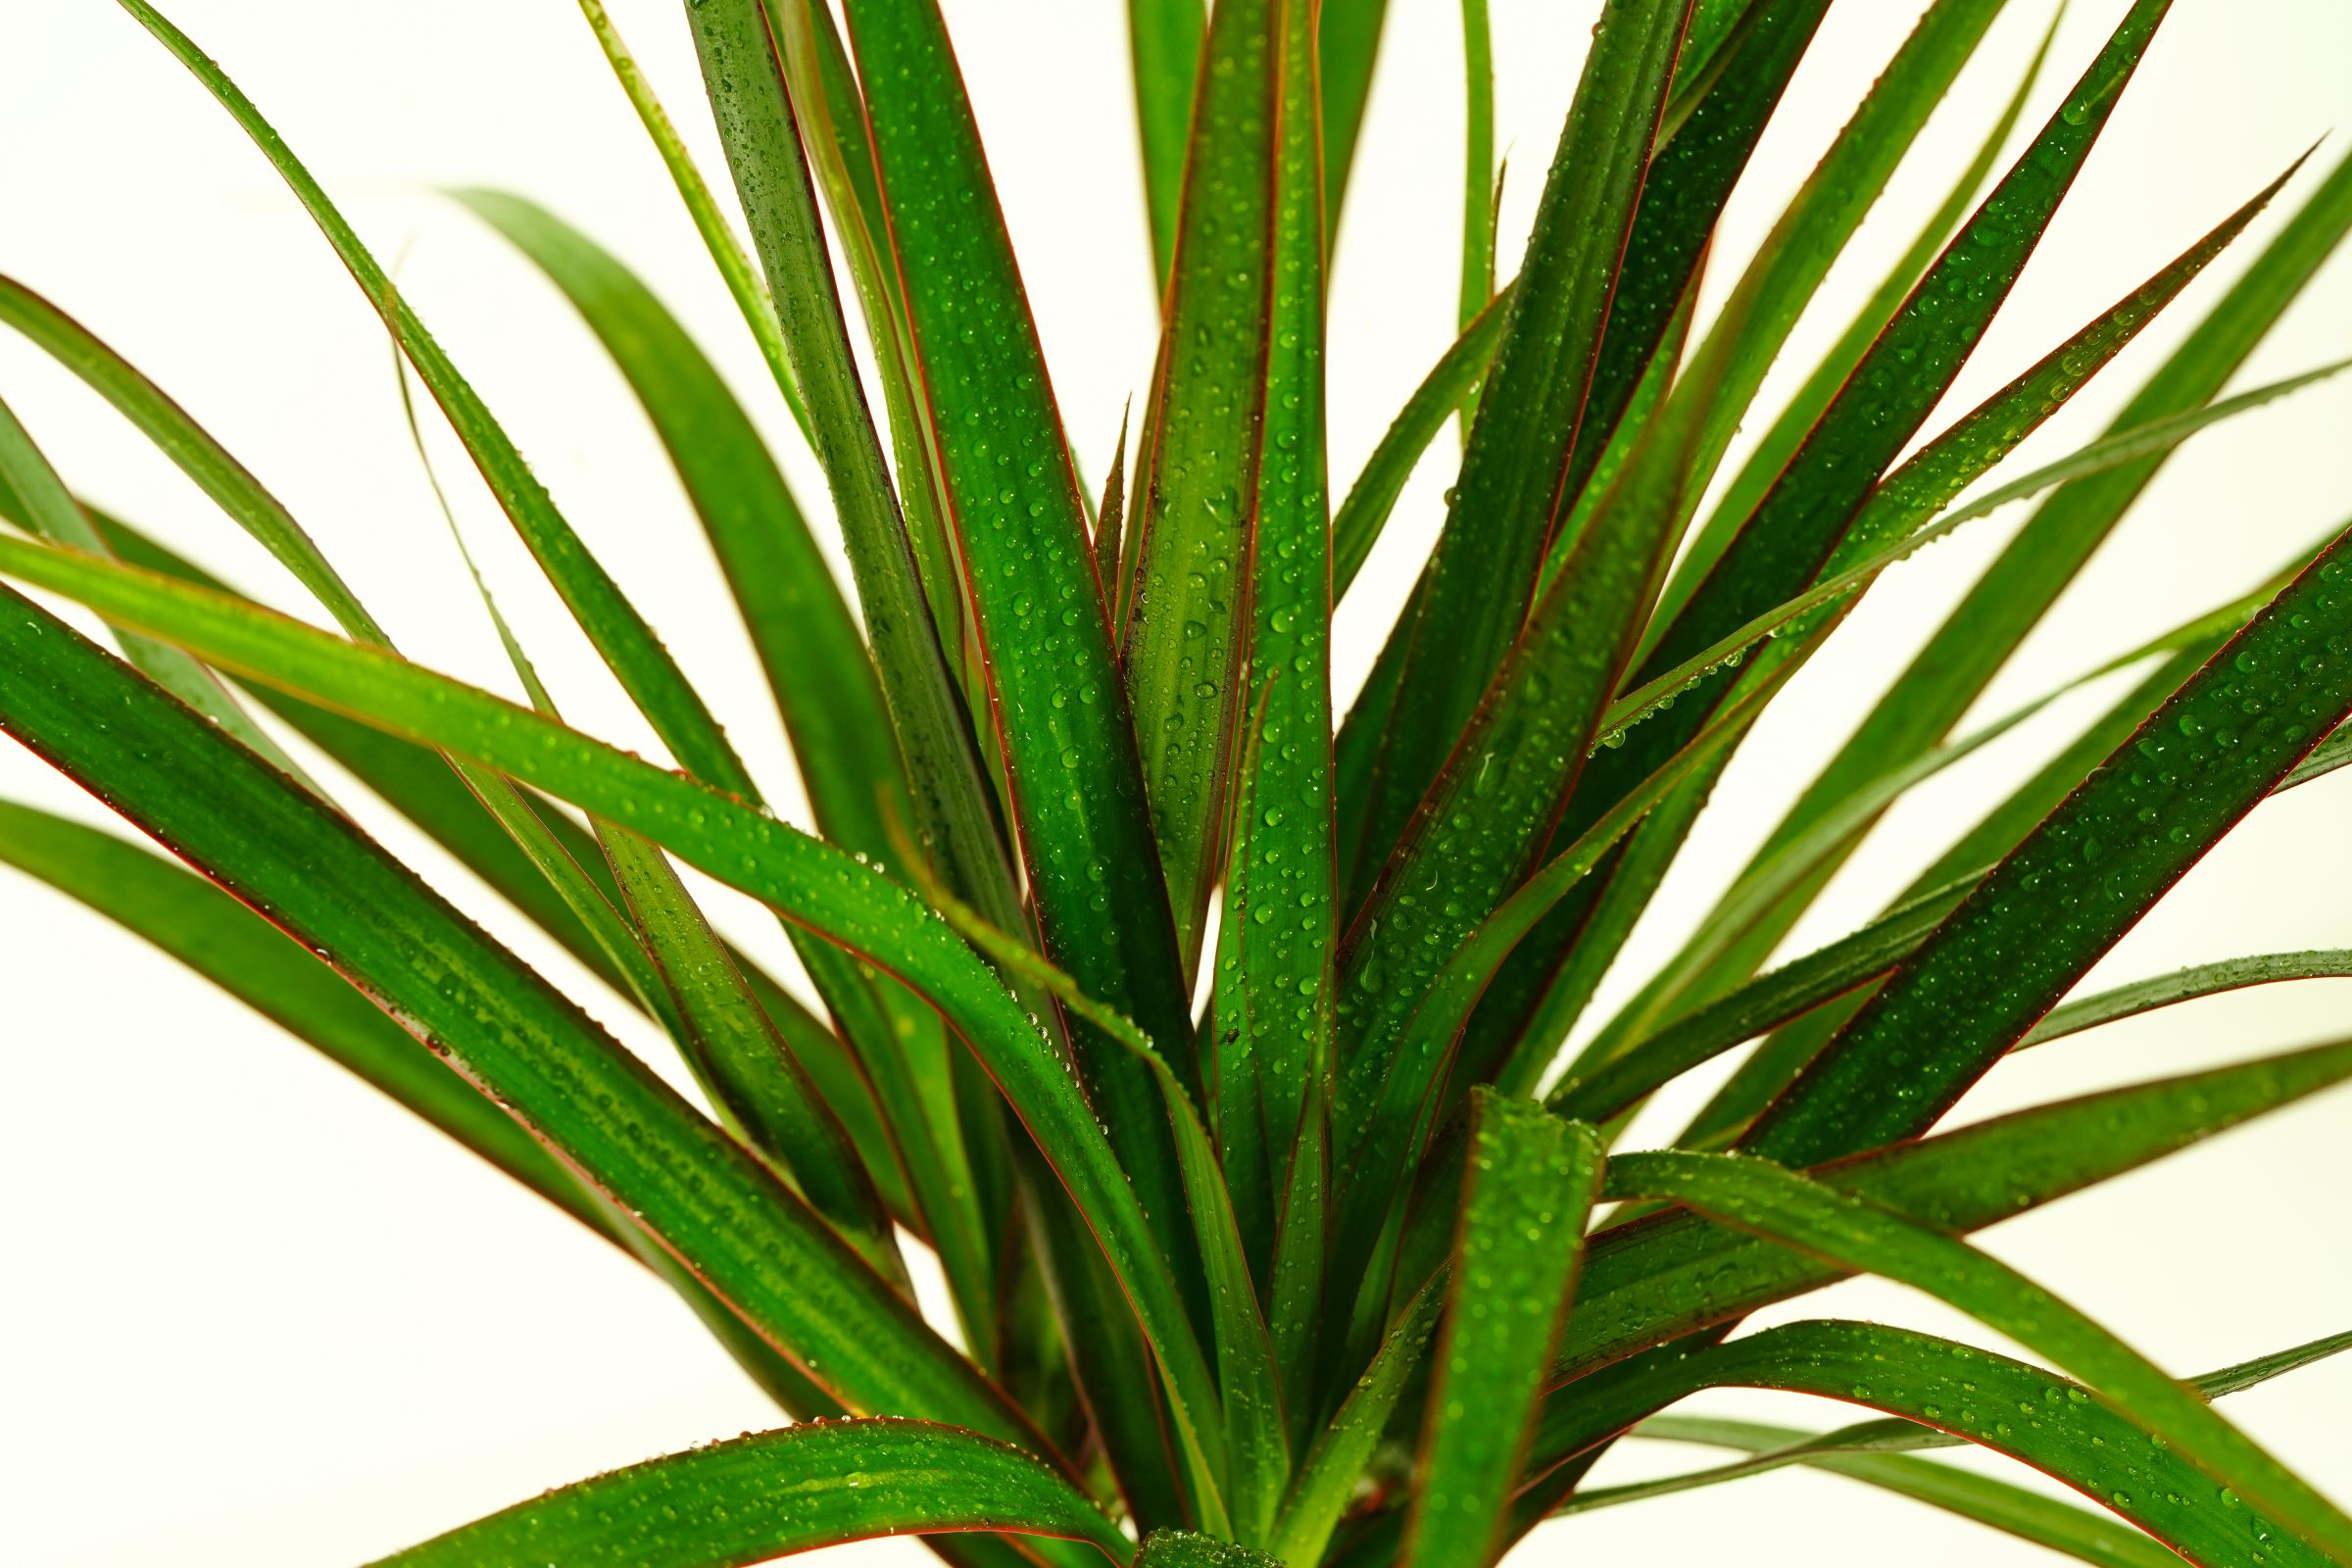 Dracaena Marginata 1 Cutting 'Indoor Plants Shrubs